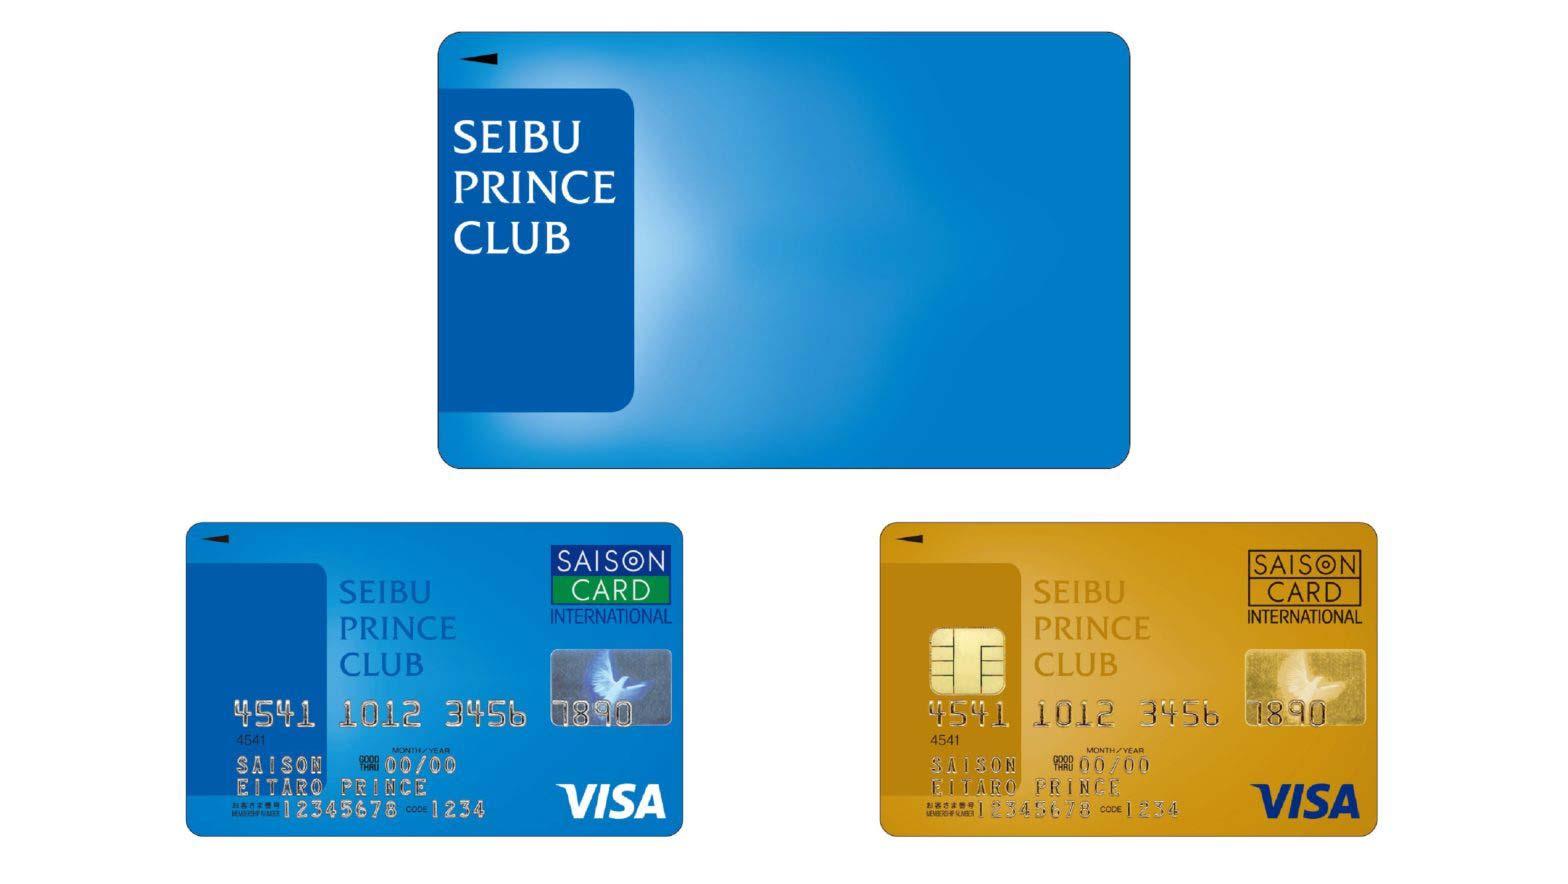 SEIBU PRINCE CLUB Prince point double & bill pre! Instagram campaign